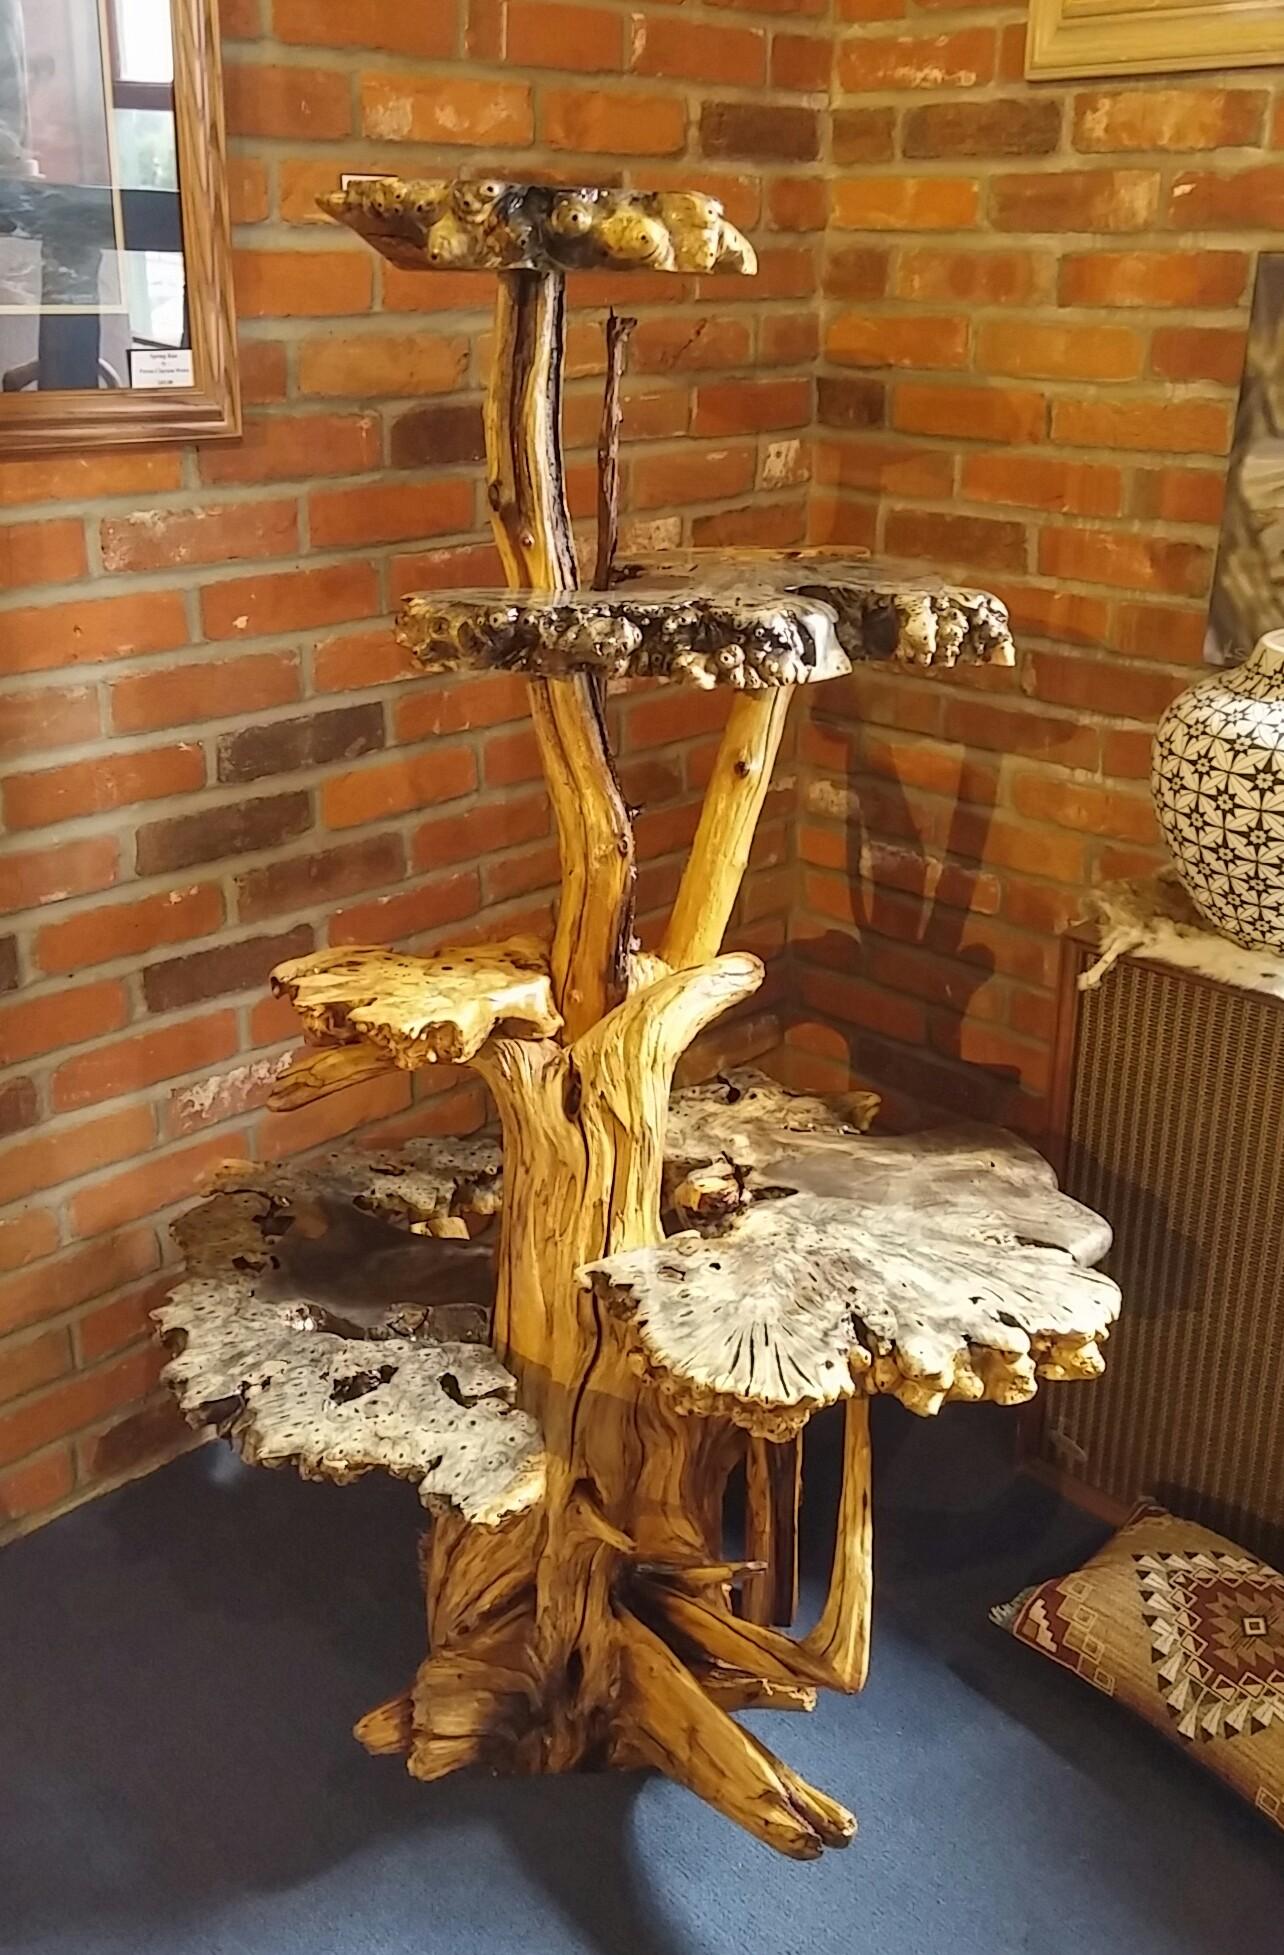 California Buckeye burl on oak display